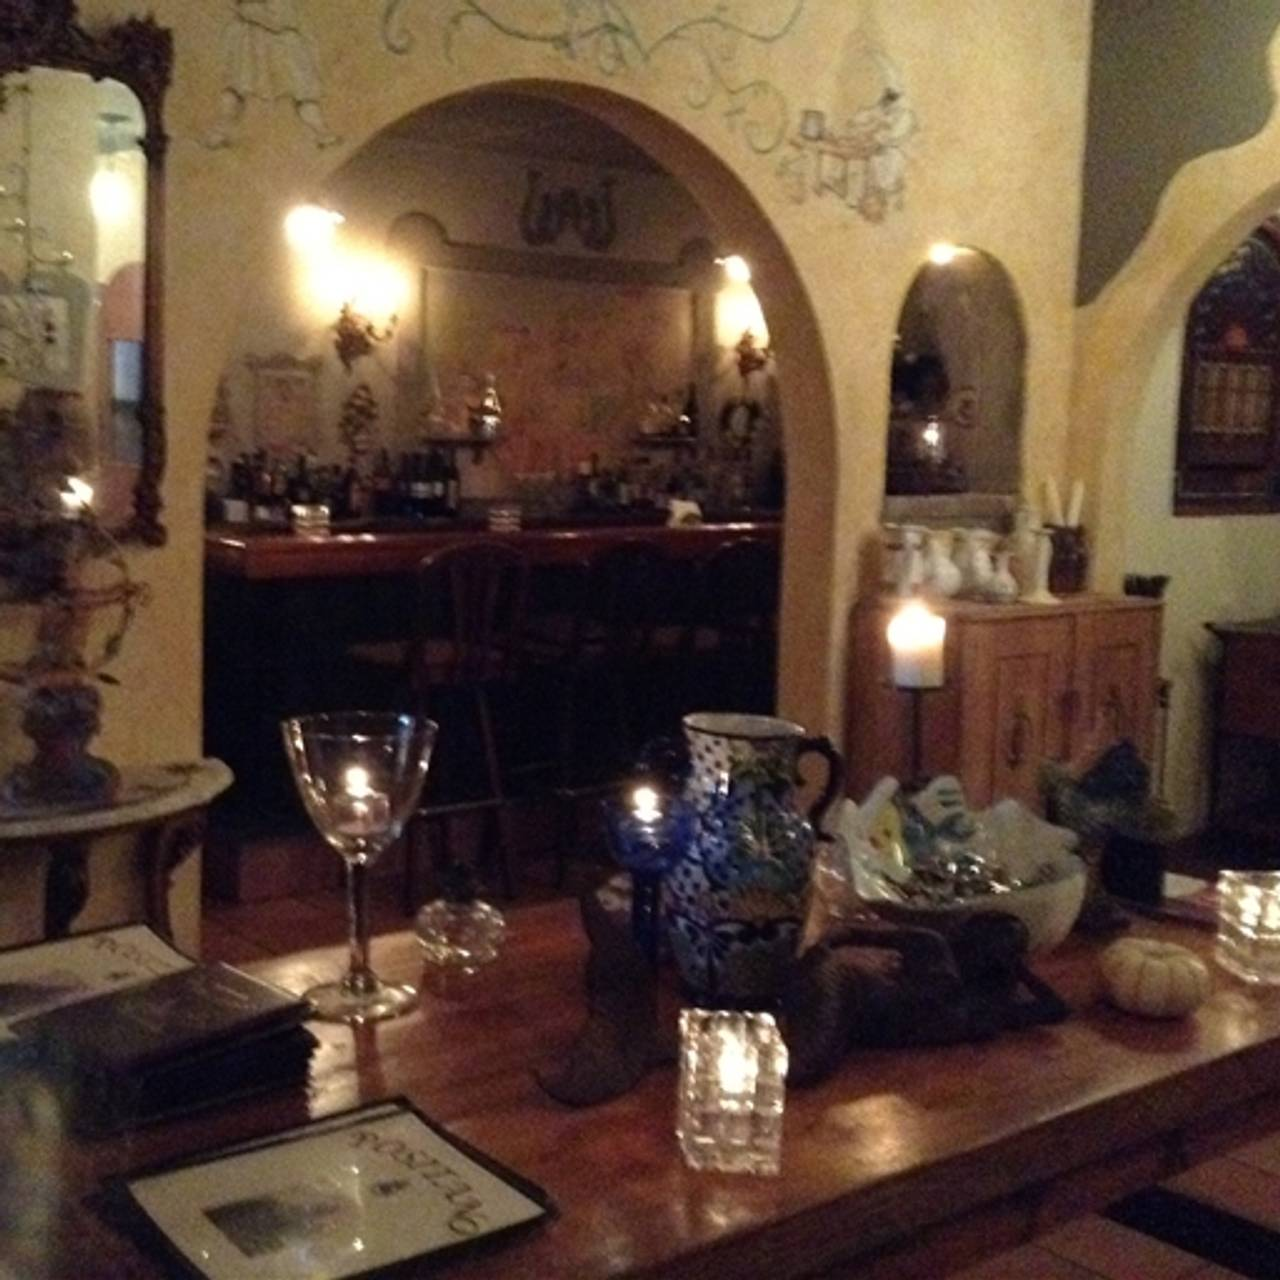 Positano Ristorante Restaurant Ardmore Pa Opentable